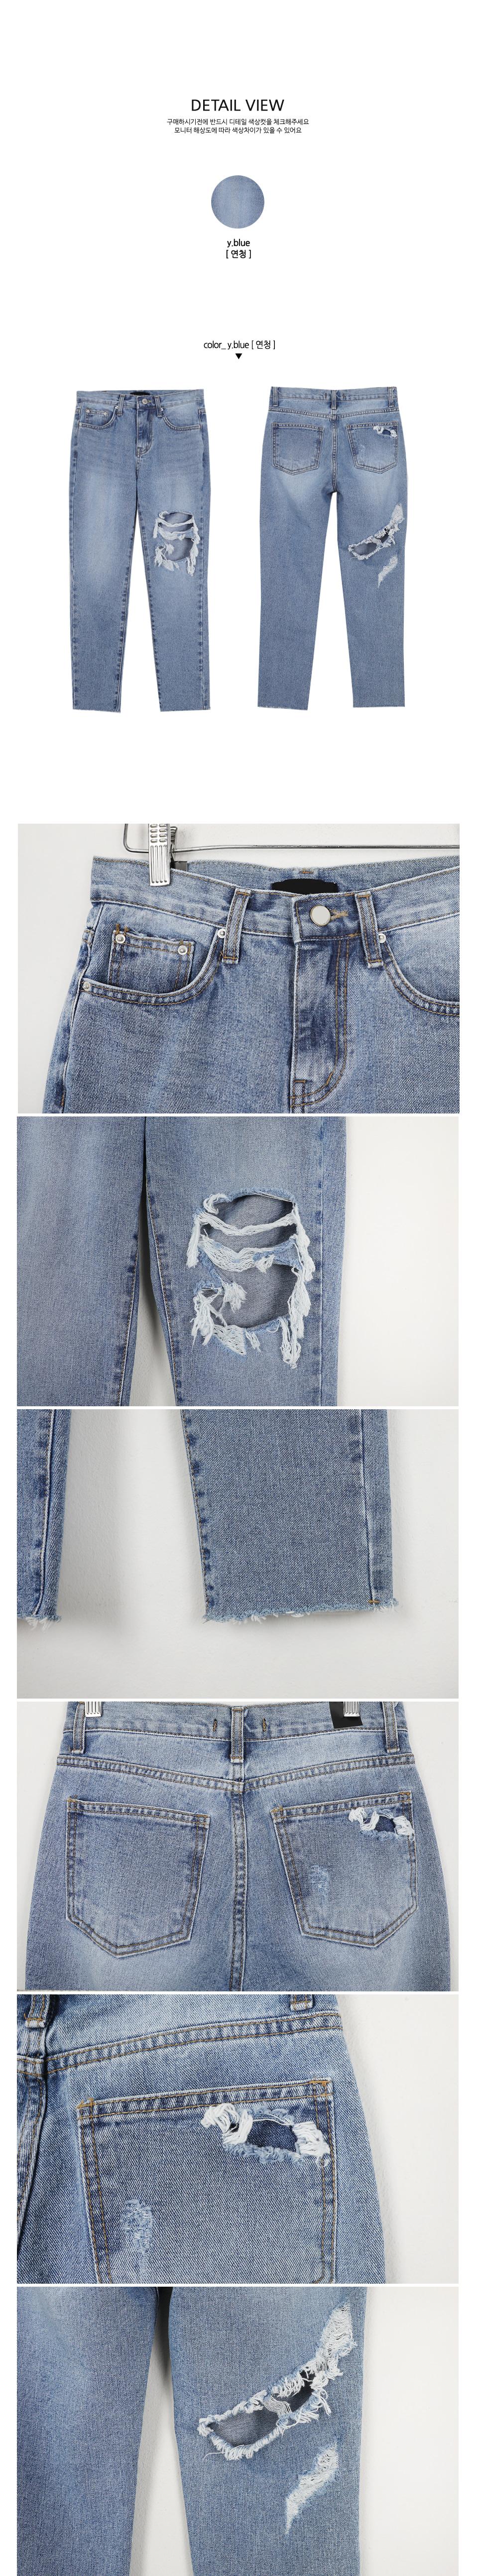 Chelsea Damage Slim exhaust pants